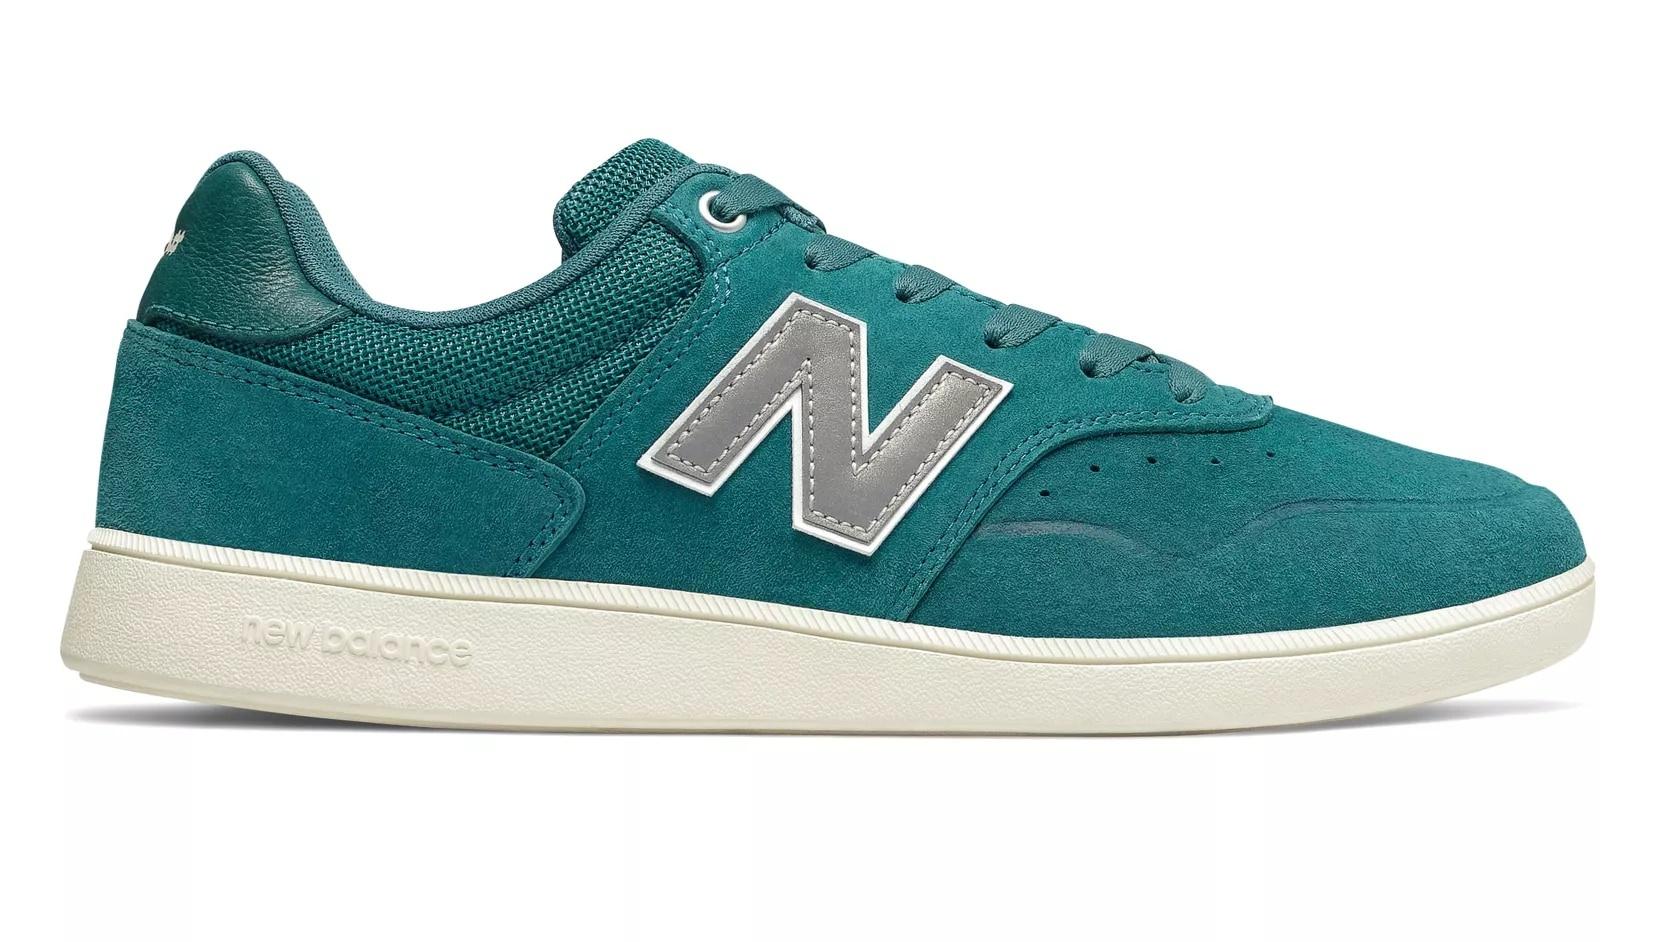 New Balance Numeric 288 Green Grey Skate Shoes